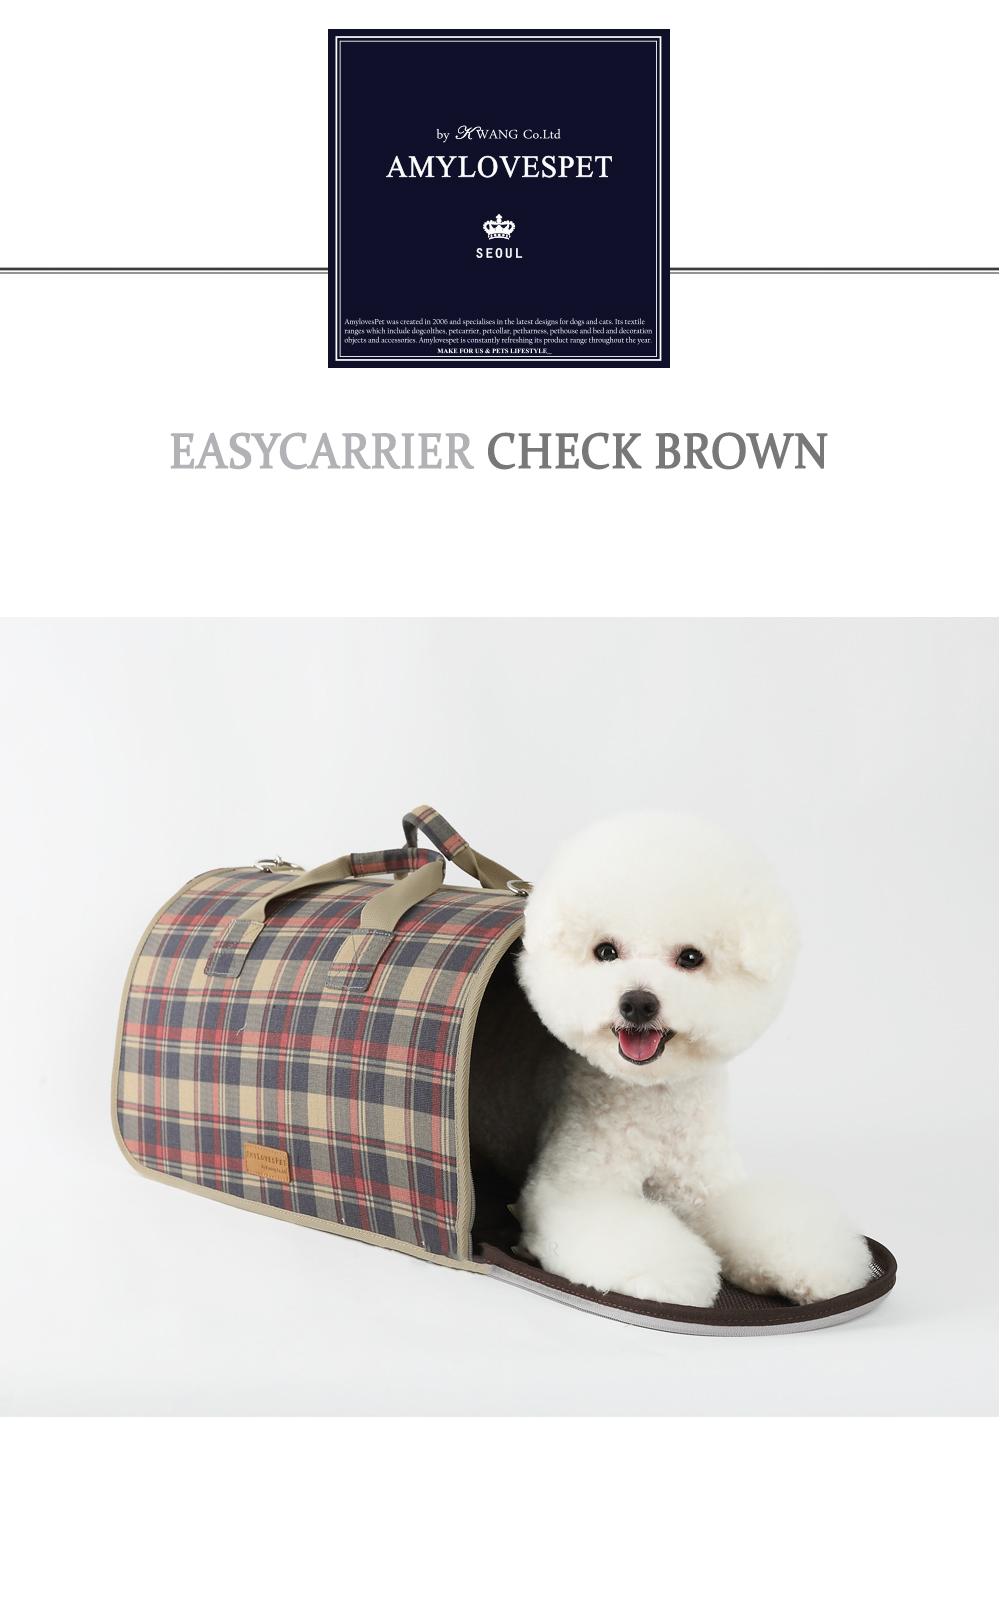 easycarriercheckbrown-detail1.jpg